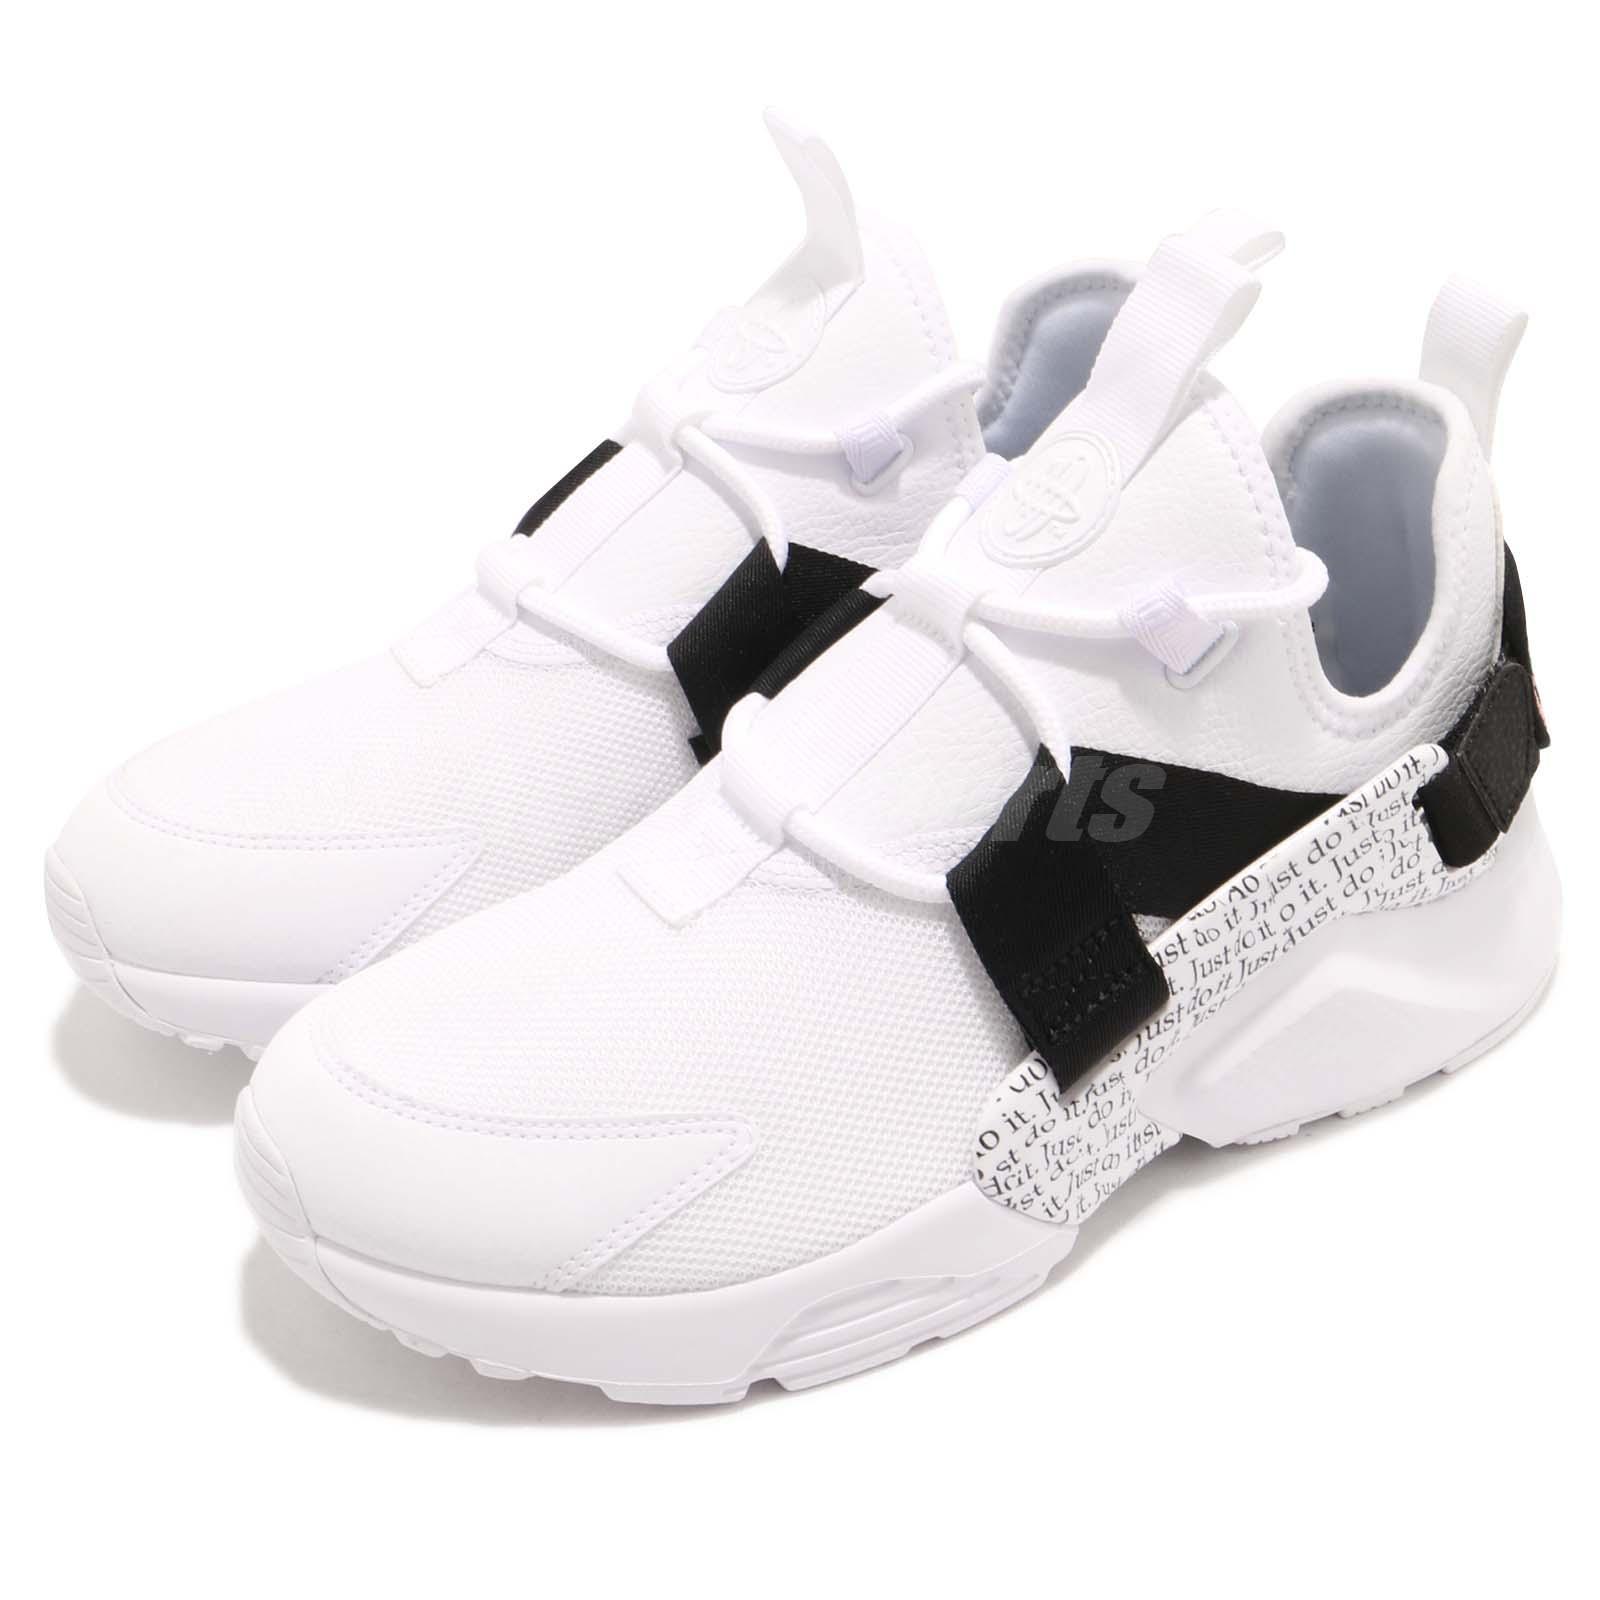 39dc37c95786 Details about Nike Wmns Air Huarache City Low PRM Just Do It JDI White  Black Women AO3140-100